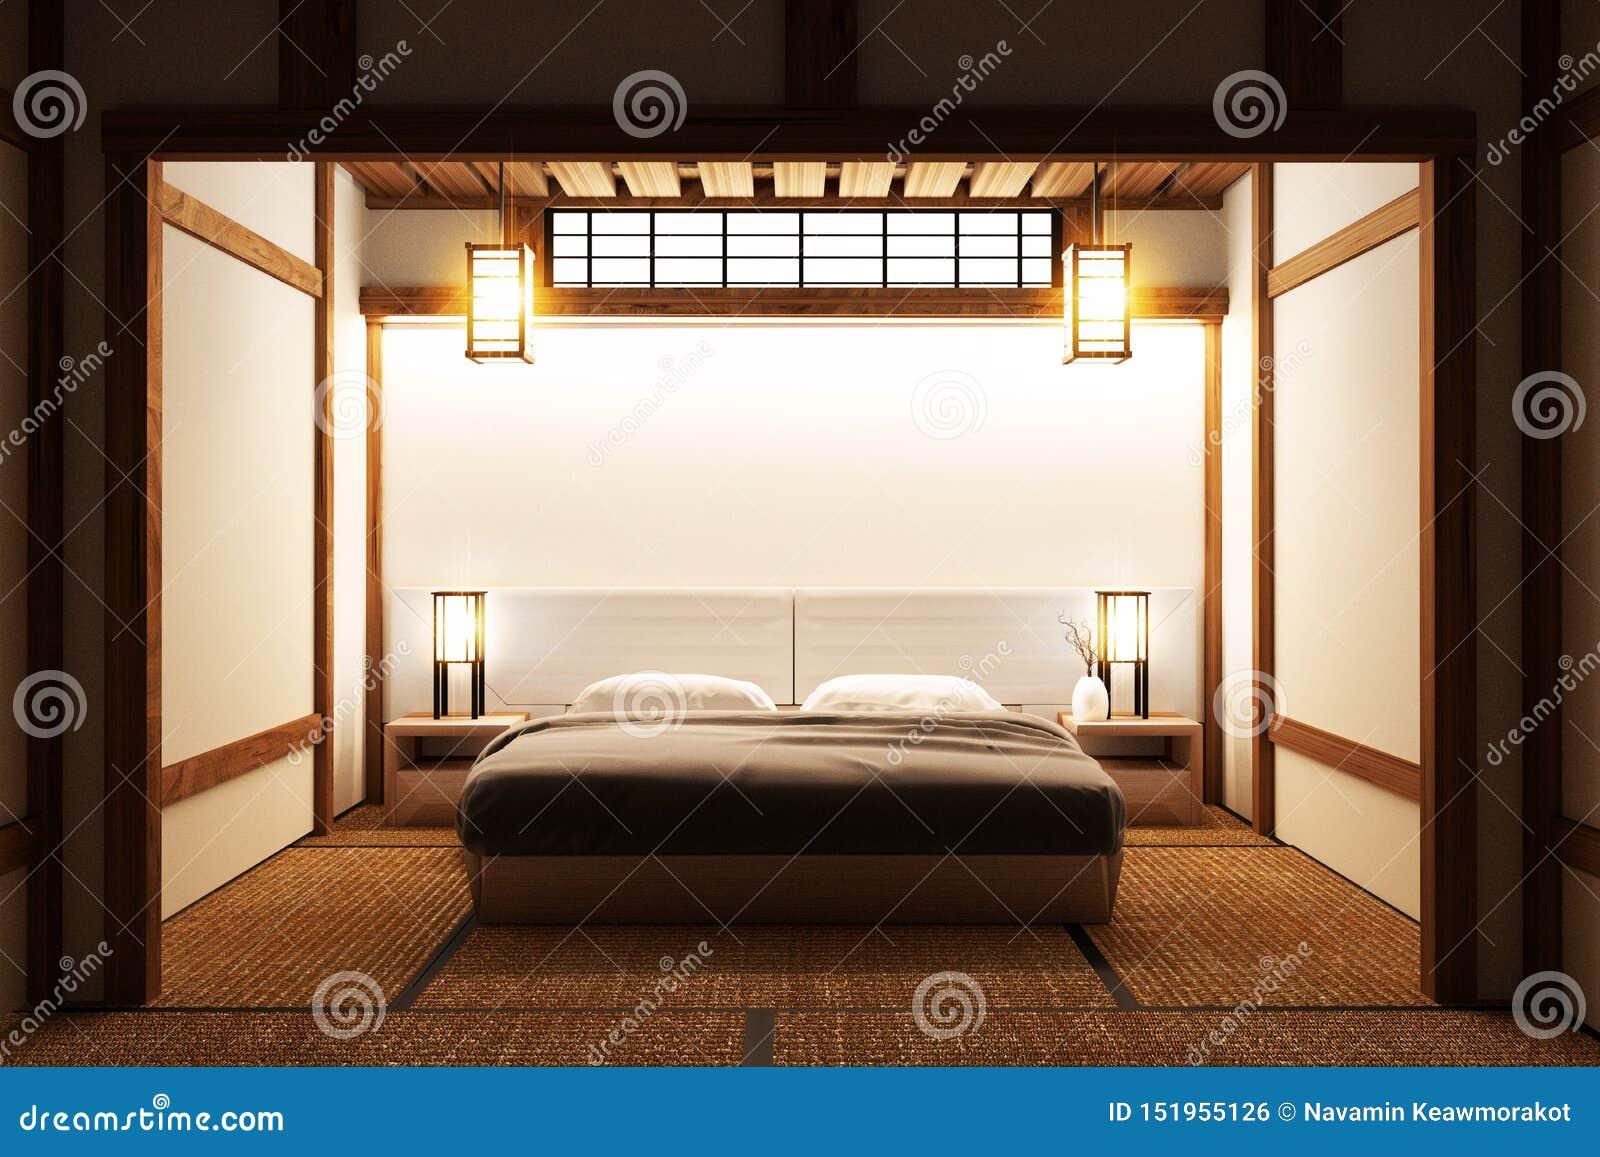 Bed Room Original Japanese Interior Design 3d Rendering Stock Illustration Illustration Of Korean Leaves 151955126